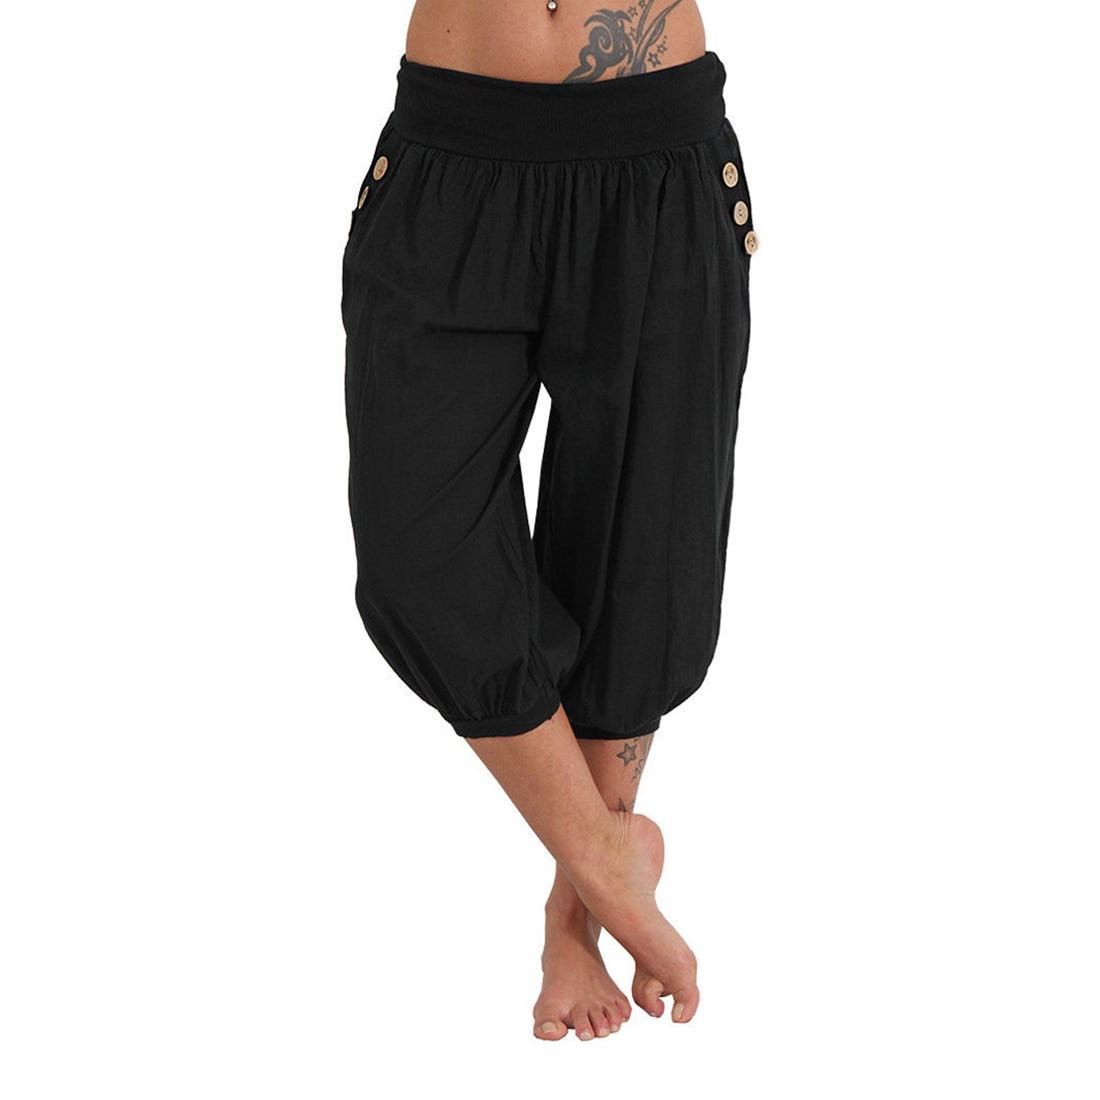 Women Solid Casual Loose Pants Low Waist Wide Leg Pants Capri Pants Trousers